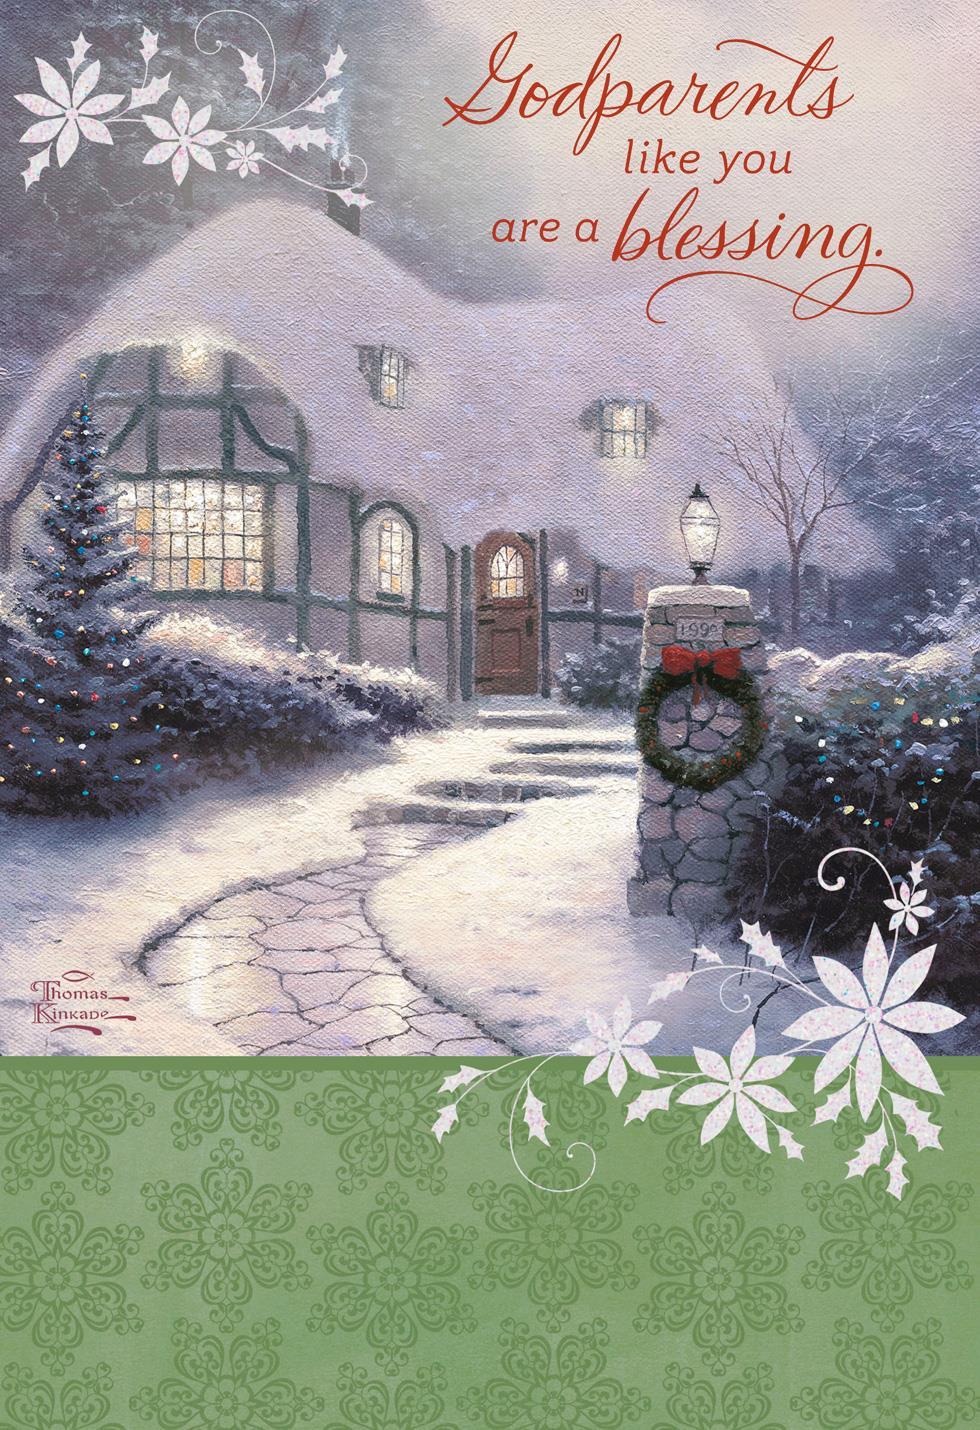 thomas kinkade youre a blessing godparents religious christmas card